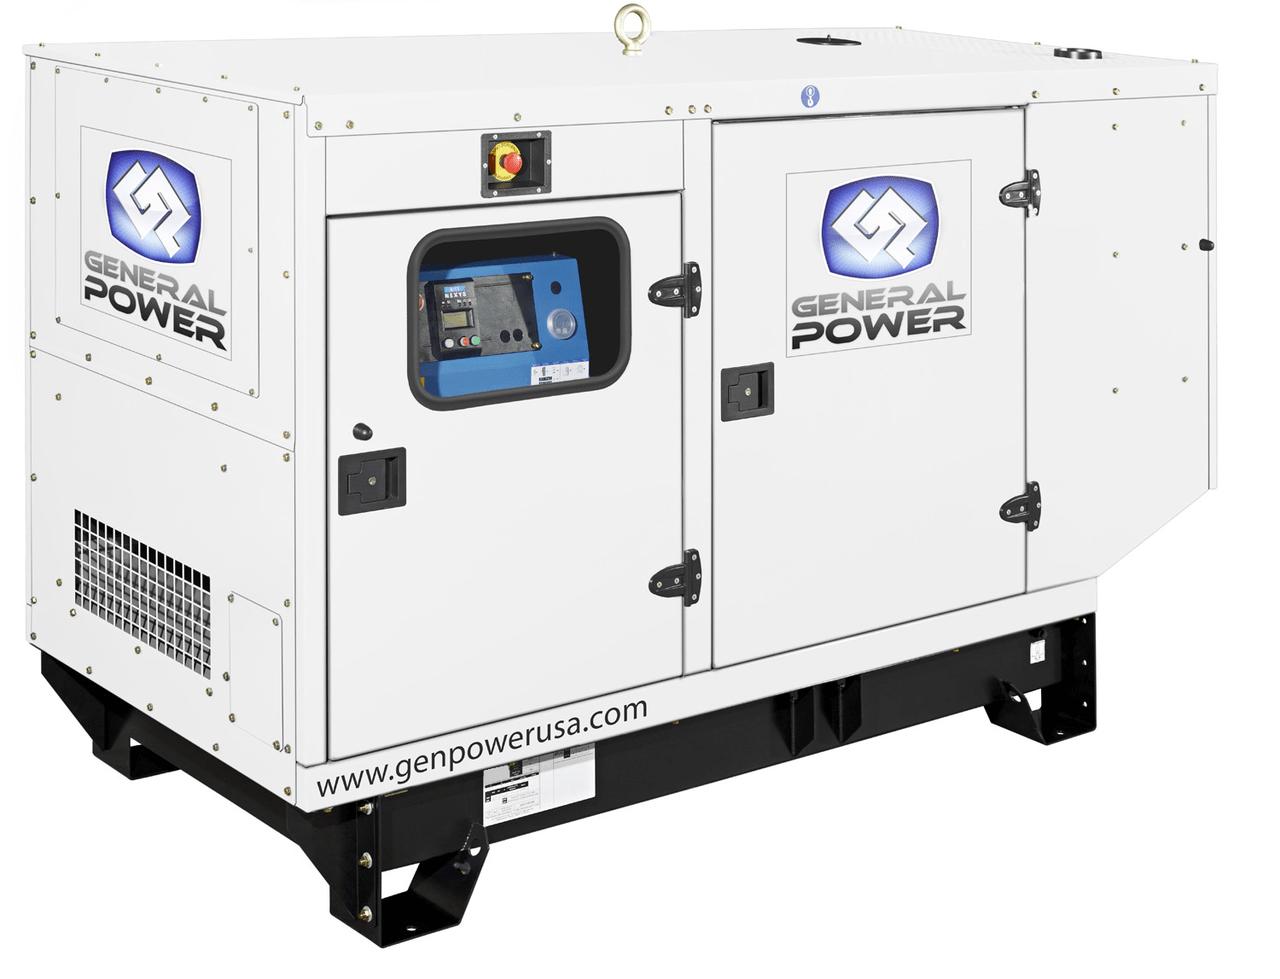 hight resolution of 100 kw diesel generator john deere diesel generator cat 22 kw generator cat 350 kw generator wiring diagram